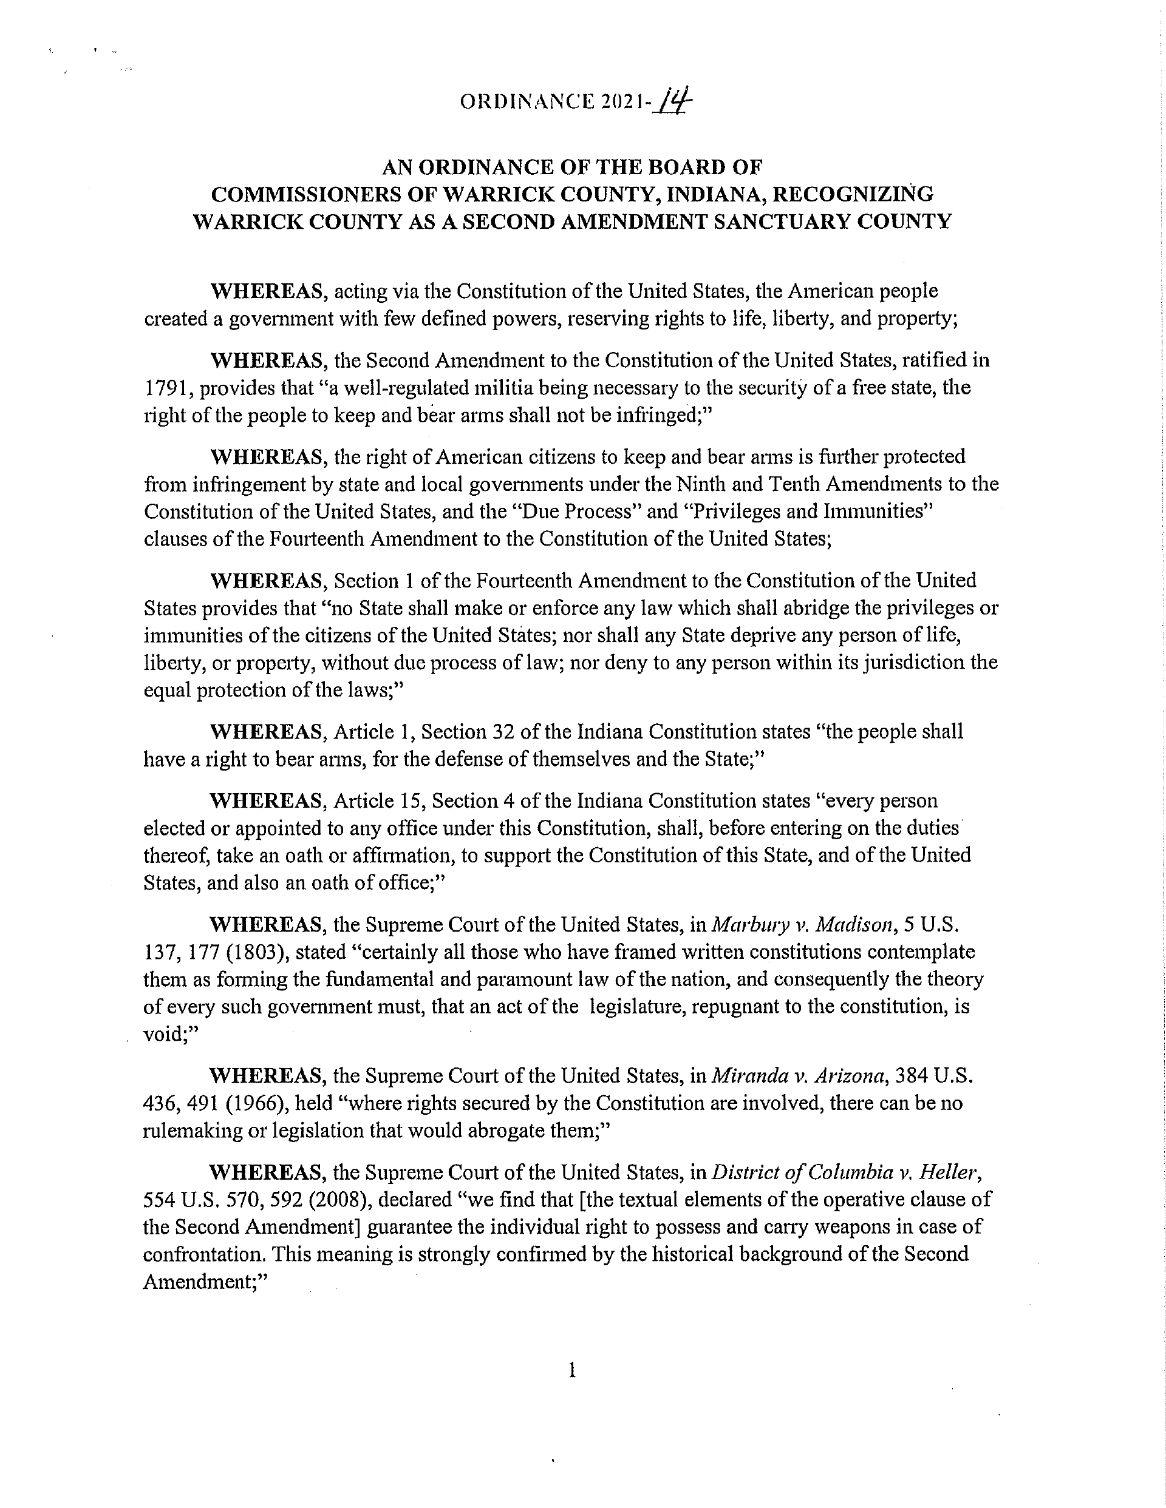 Warrick County Second Amendment Sanctuary Ordinance pg1